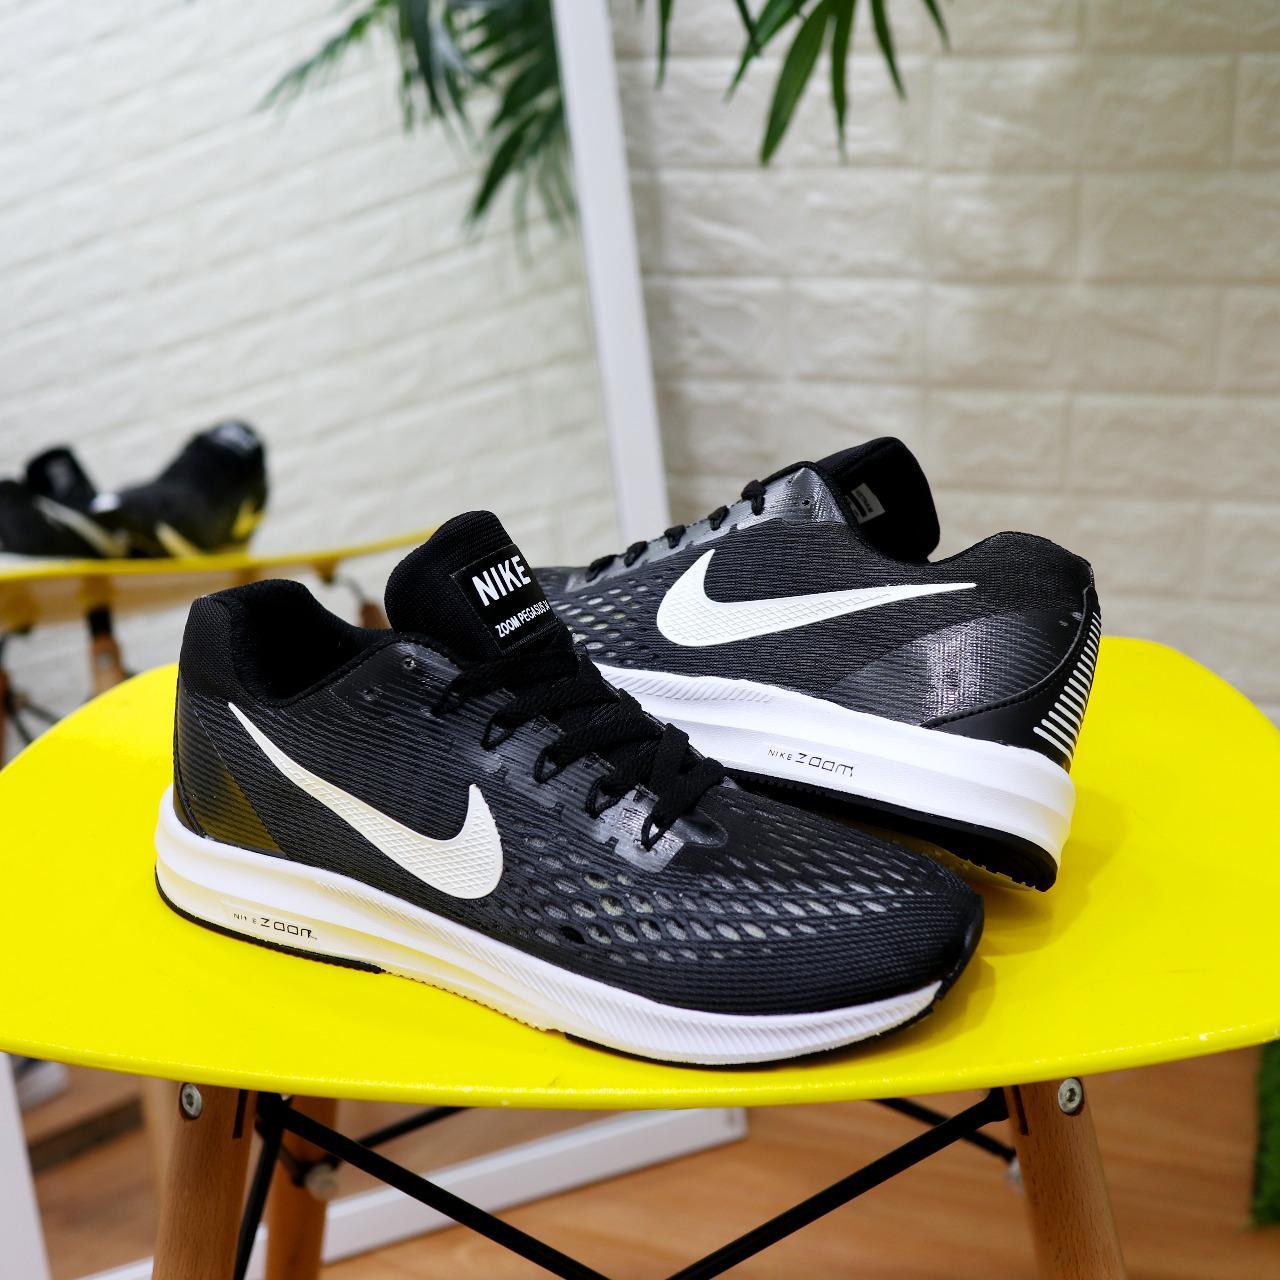 COD NOW !! sepatu running _nike AIRMAX ZOOM / sepatu pria /sepatu running / sepatu olahraga /sepatu laki